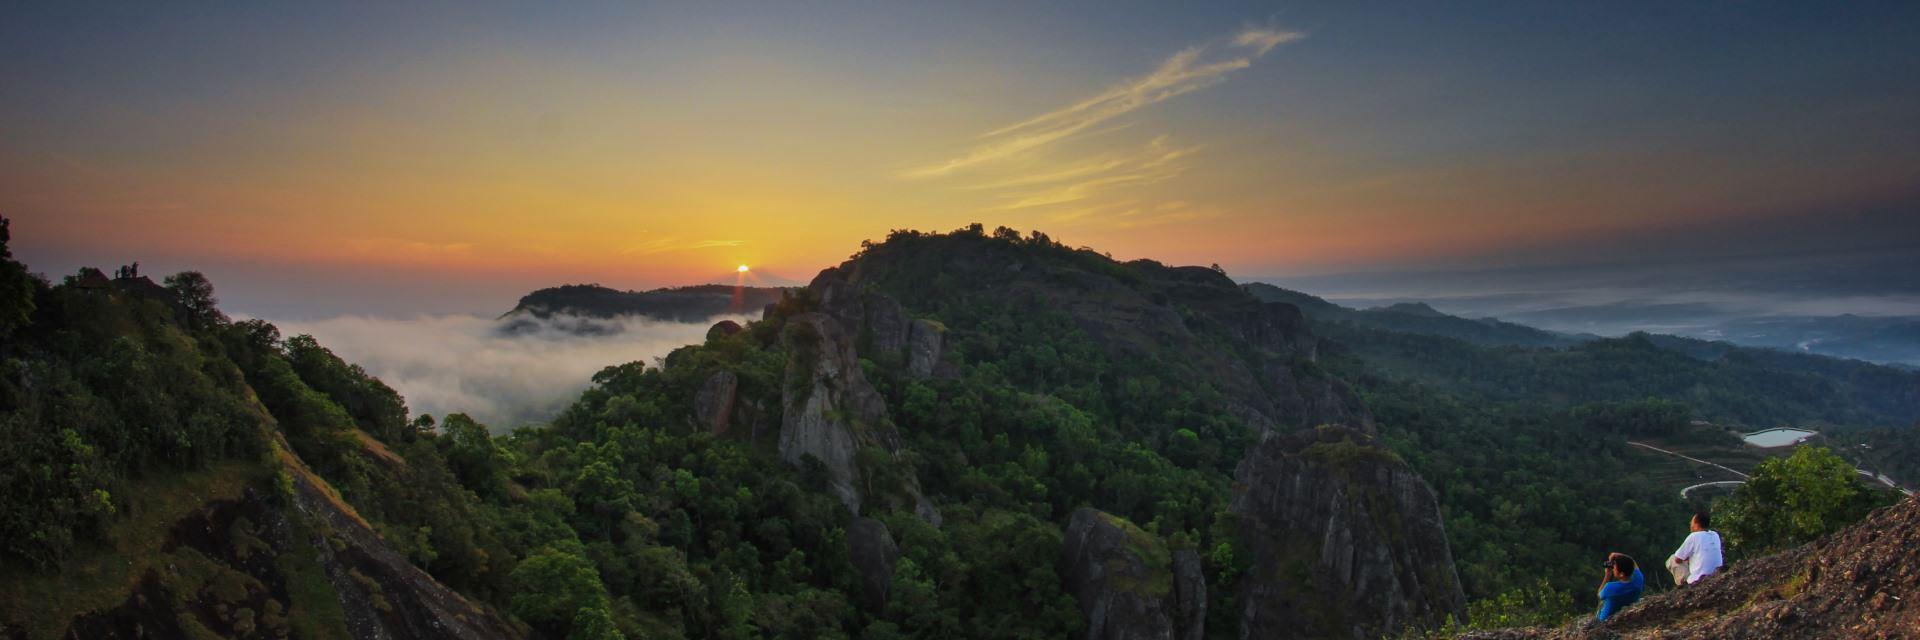 15 Spot Terbaik Sunrise Yogyakarta 15 Spot Terbaik Sunrise Yogyakarta - Dolan Dolen